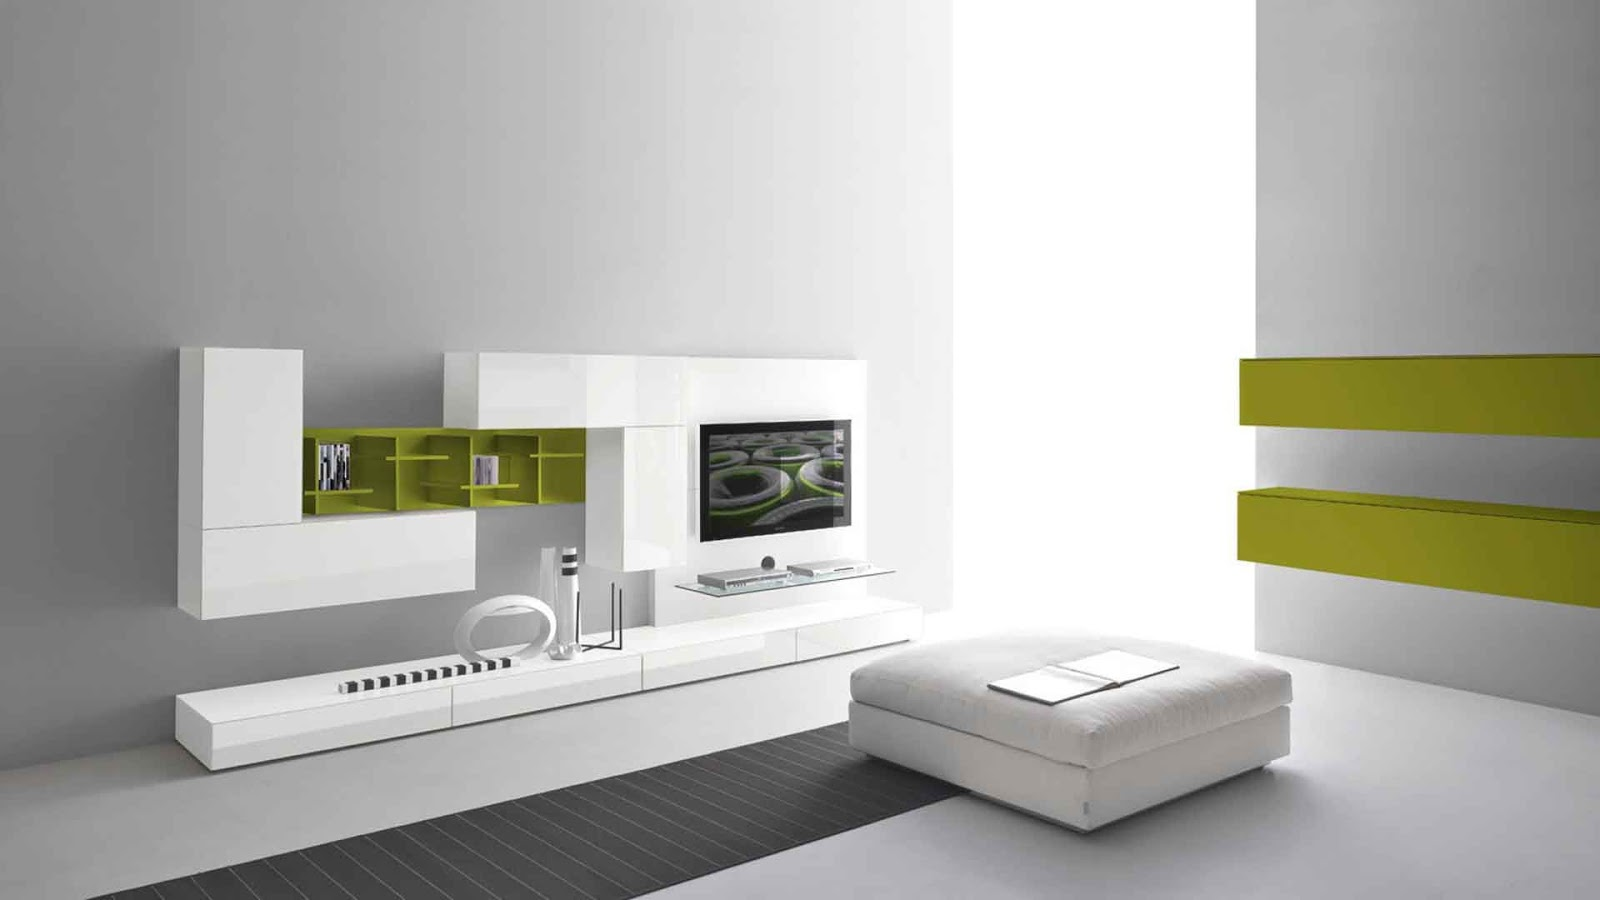 100 Model Rak Tv Minimalis Terbaru 2017 2018 Rumahku Unik # Meuble Tv Karat